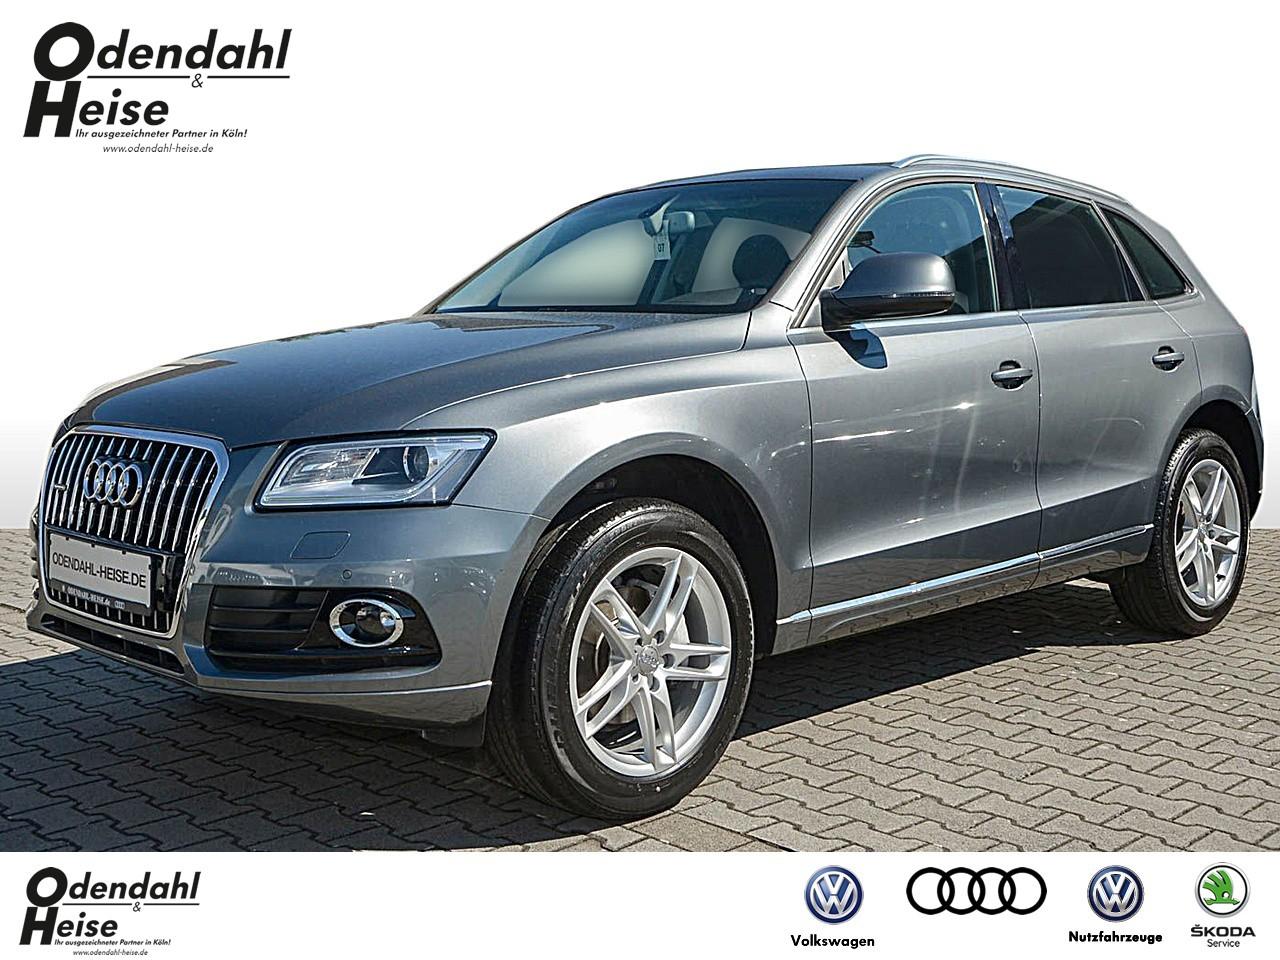 Audi Q5 quattro 2.0 TDI 6-Gang Klima Xenon, Jahr 2014, Diesel